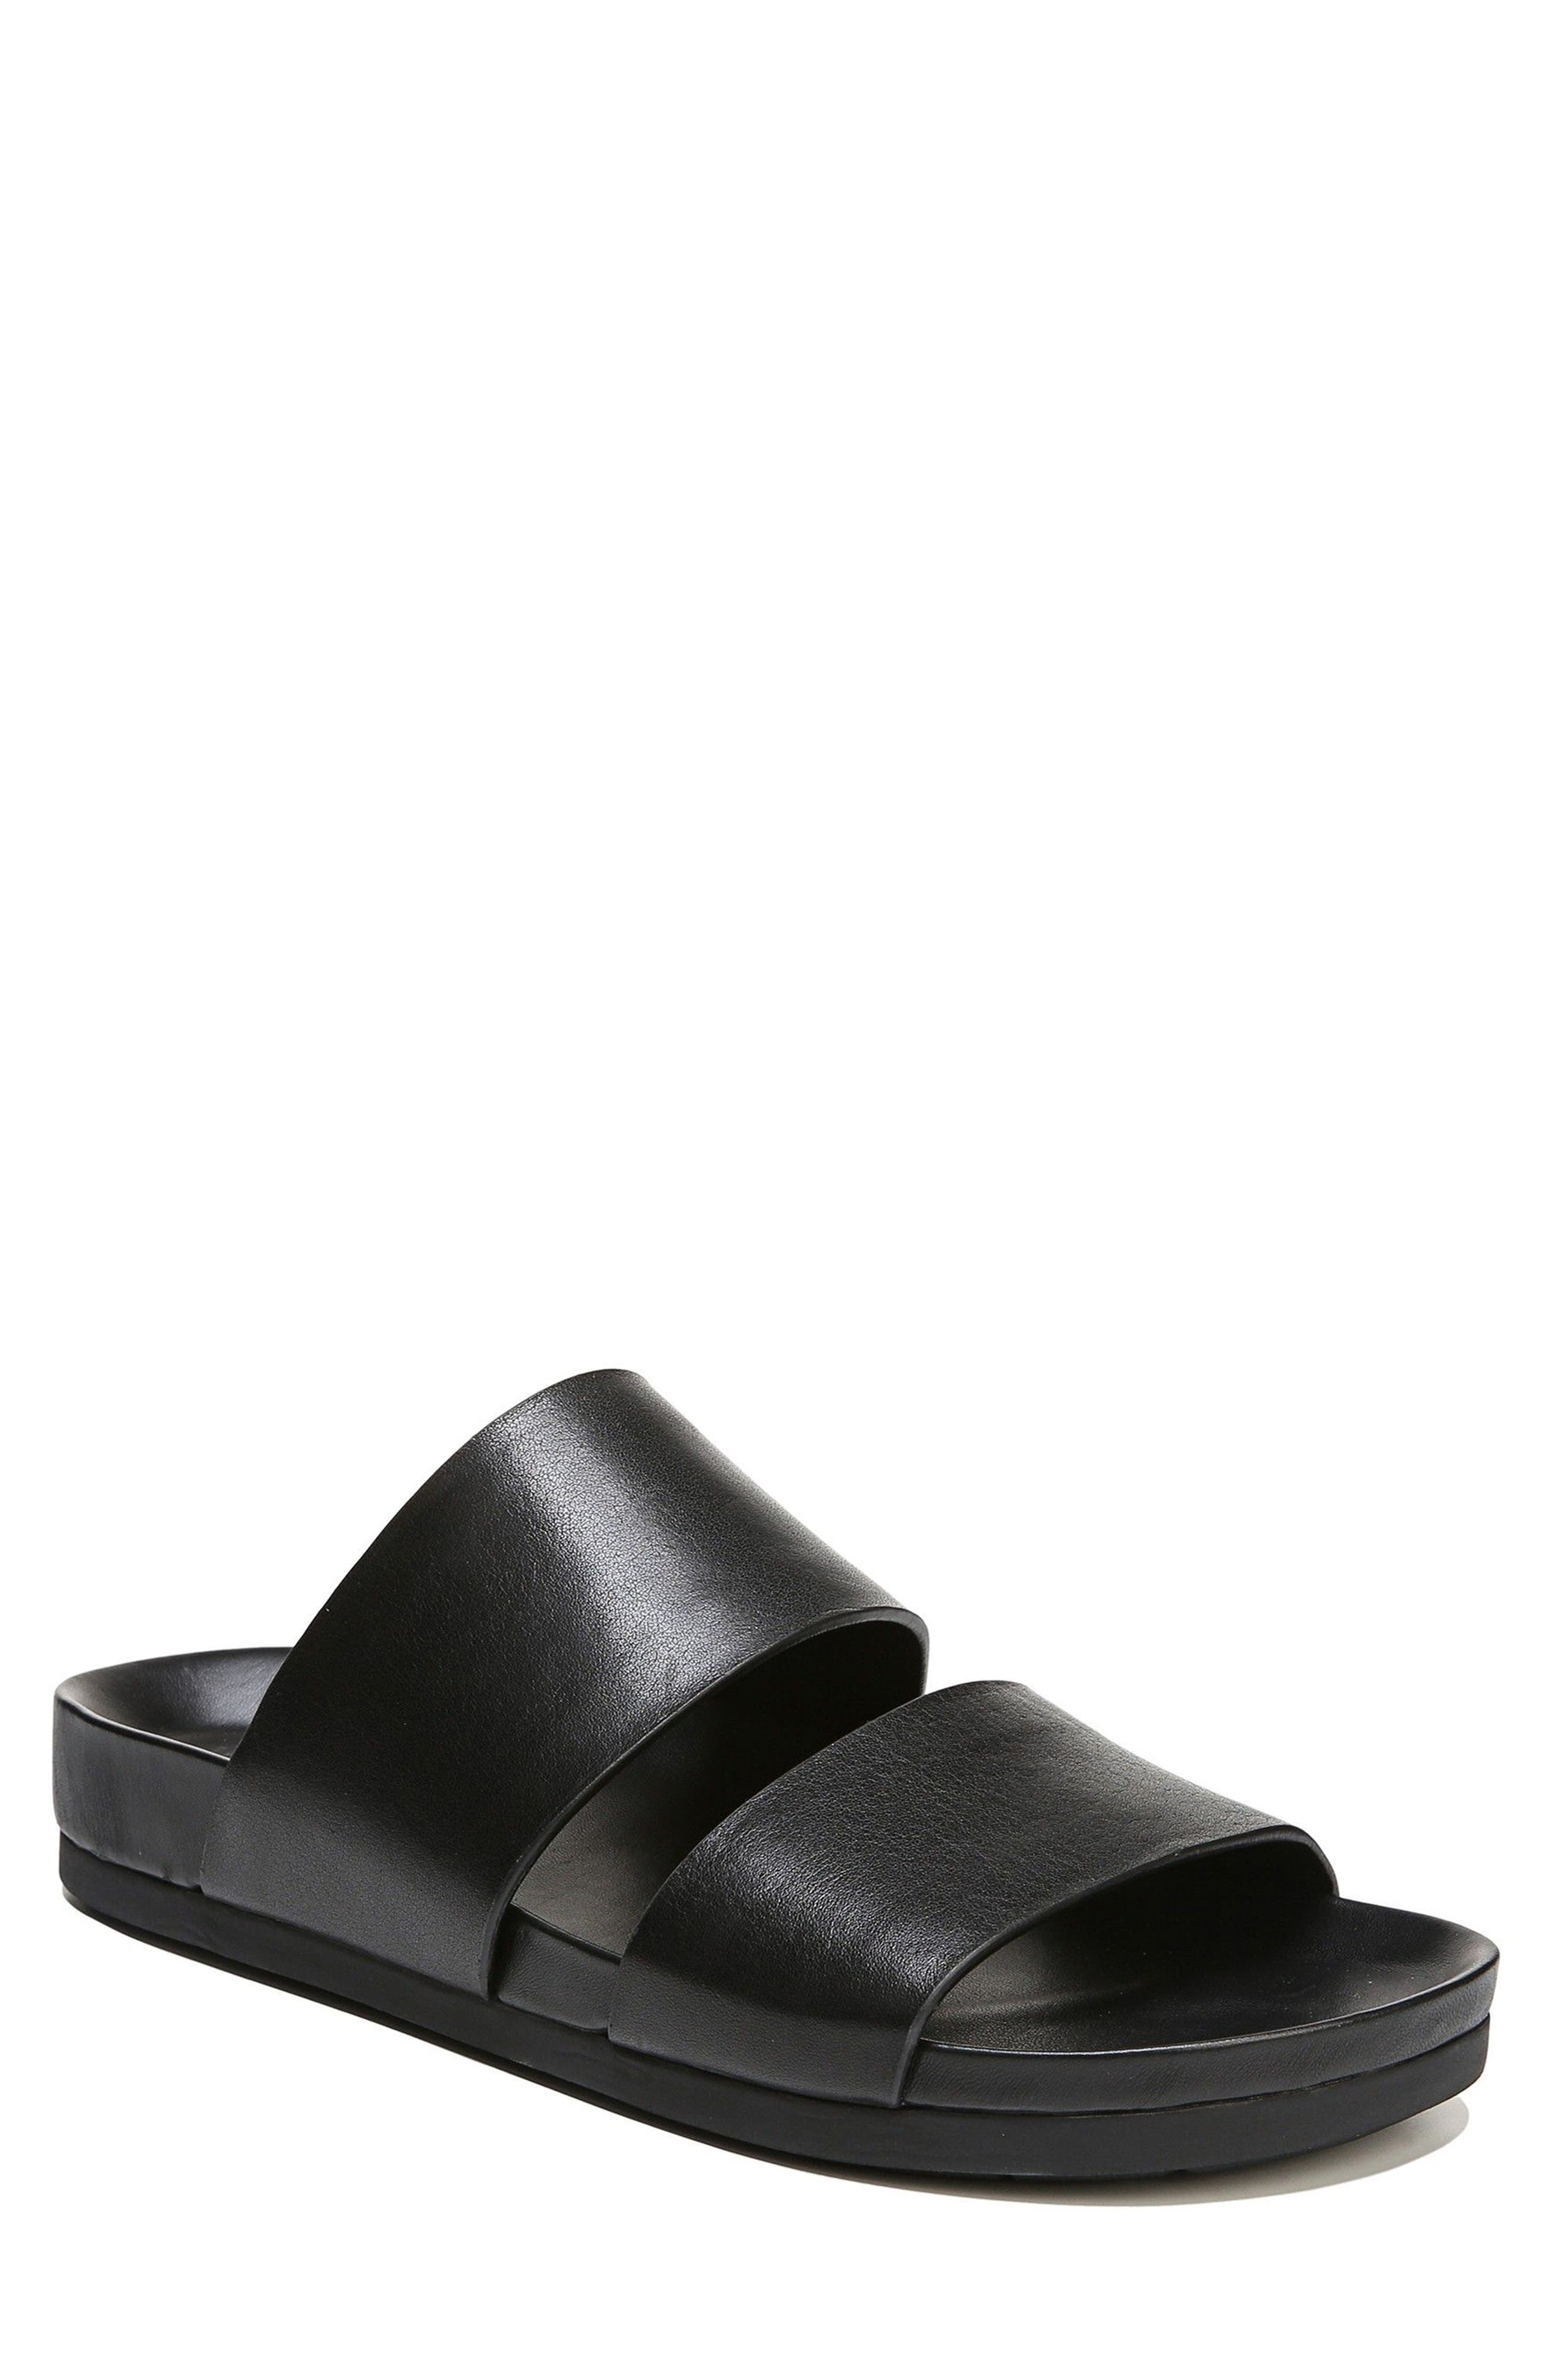 Malibu Slide Sandal,                         Main,                         color, 001